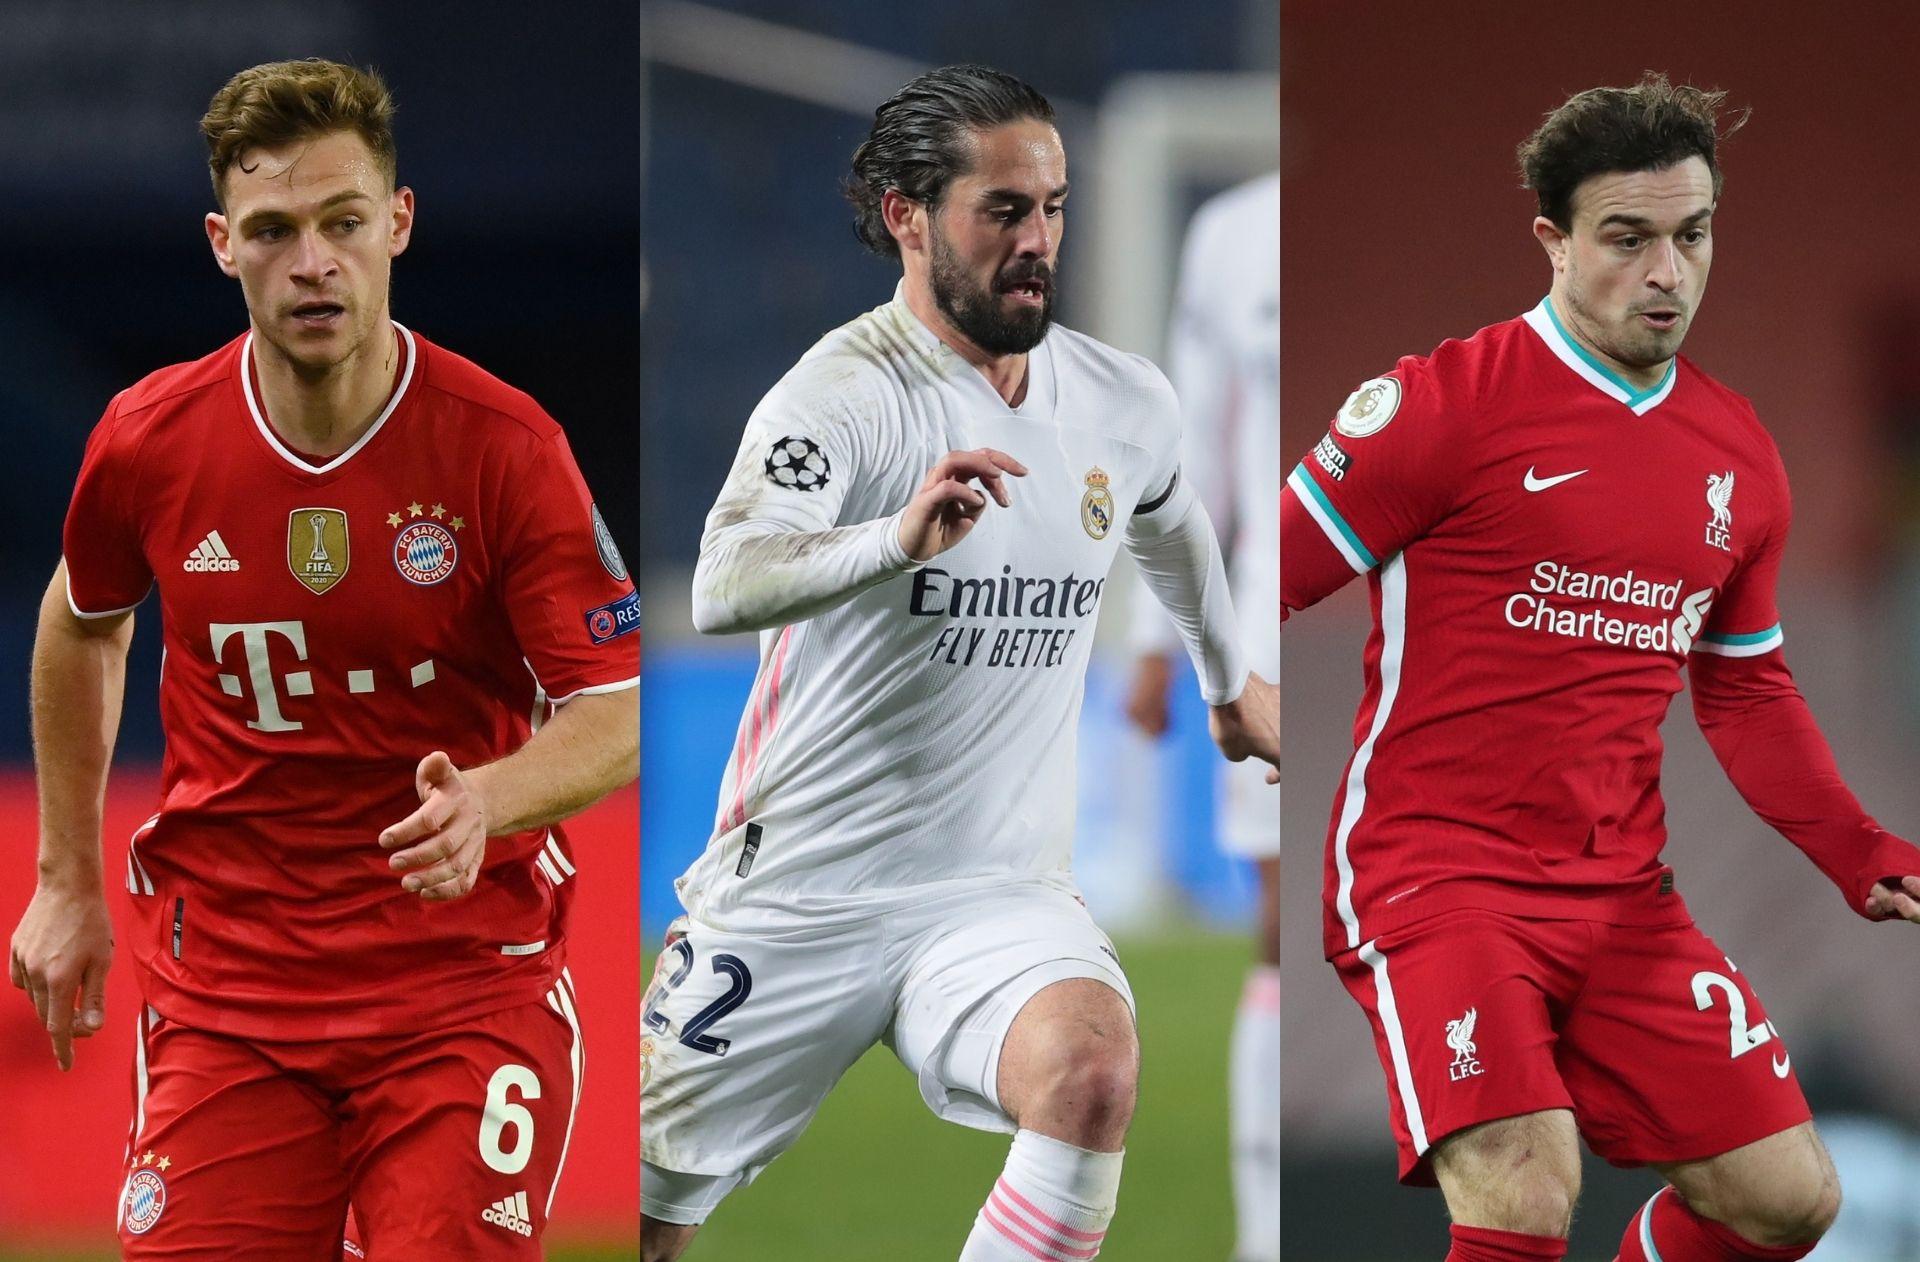 Kimmich - Bayern, Isco - Real Madrid, Shaqiri - Liverpool